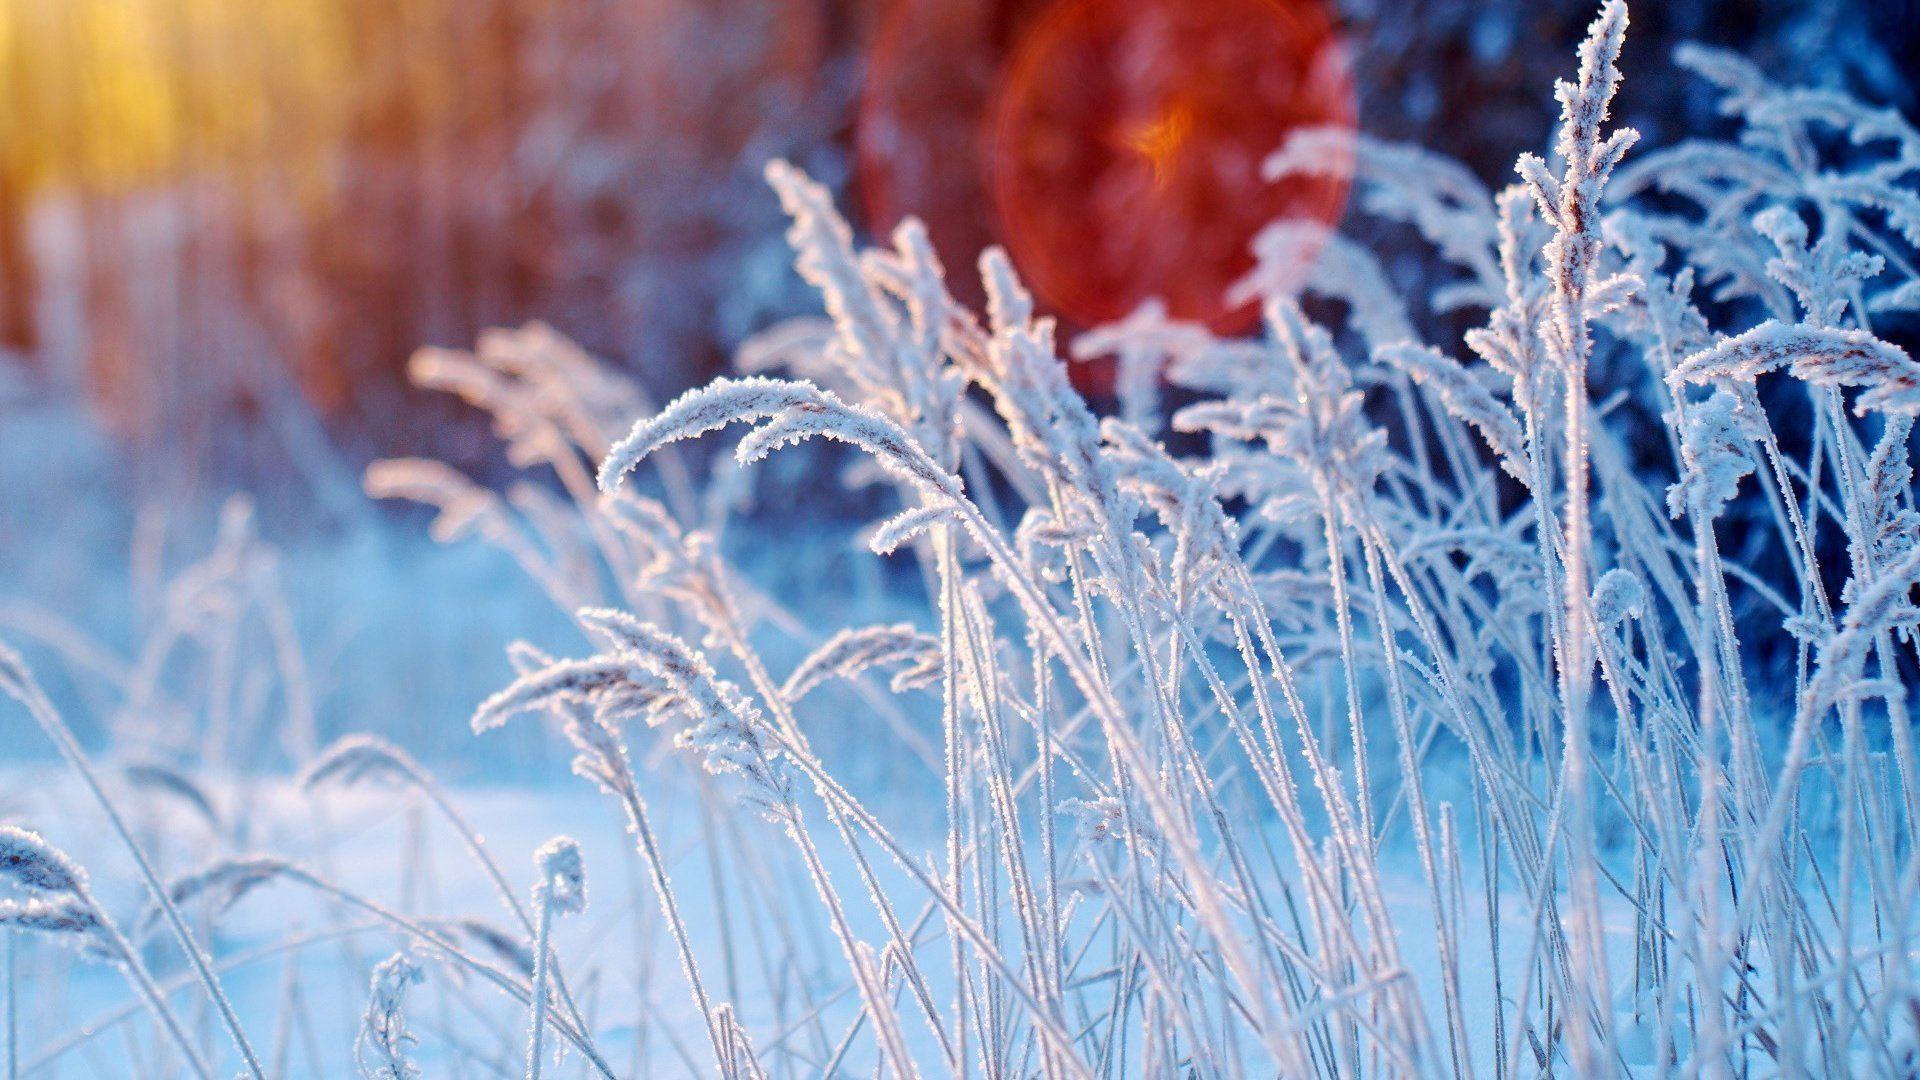 Macro Winter wallpaper image hd